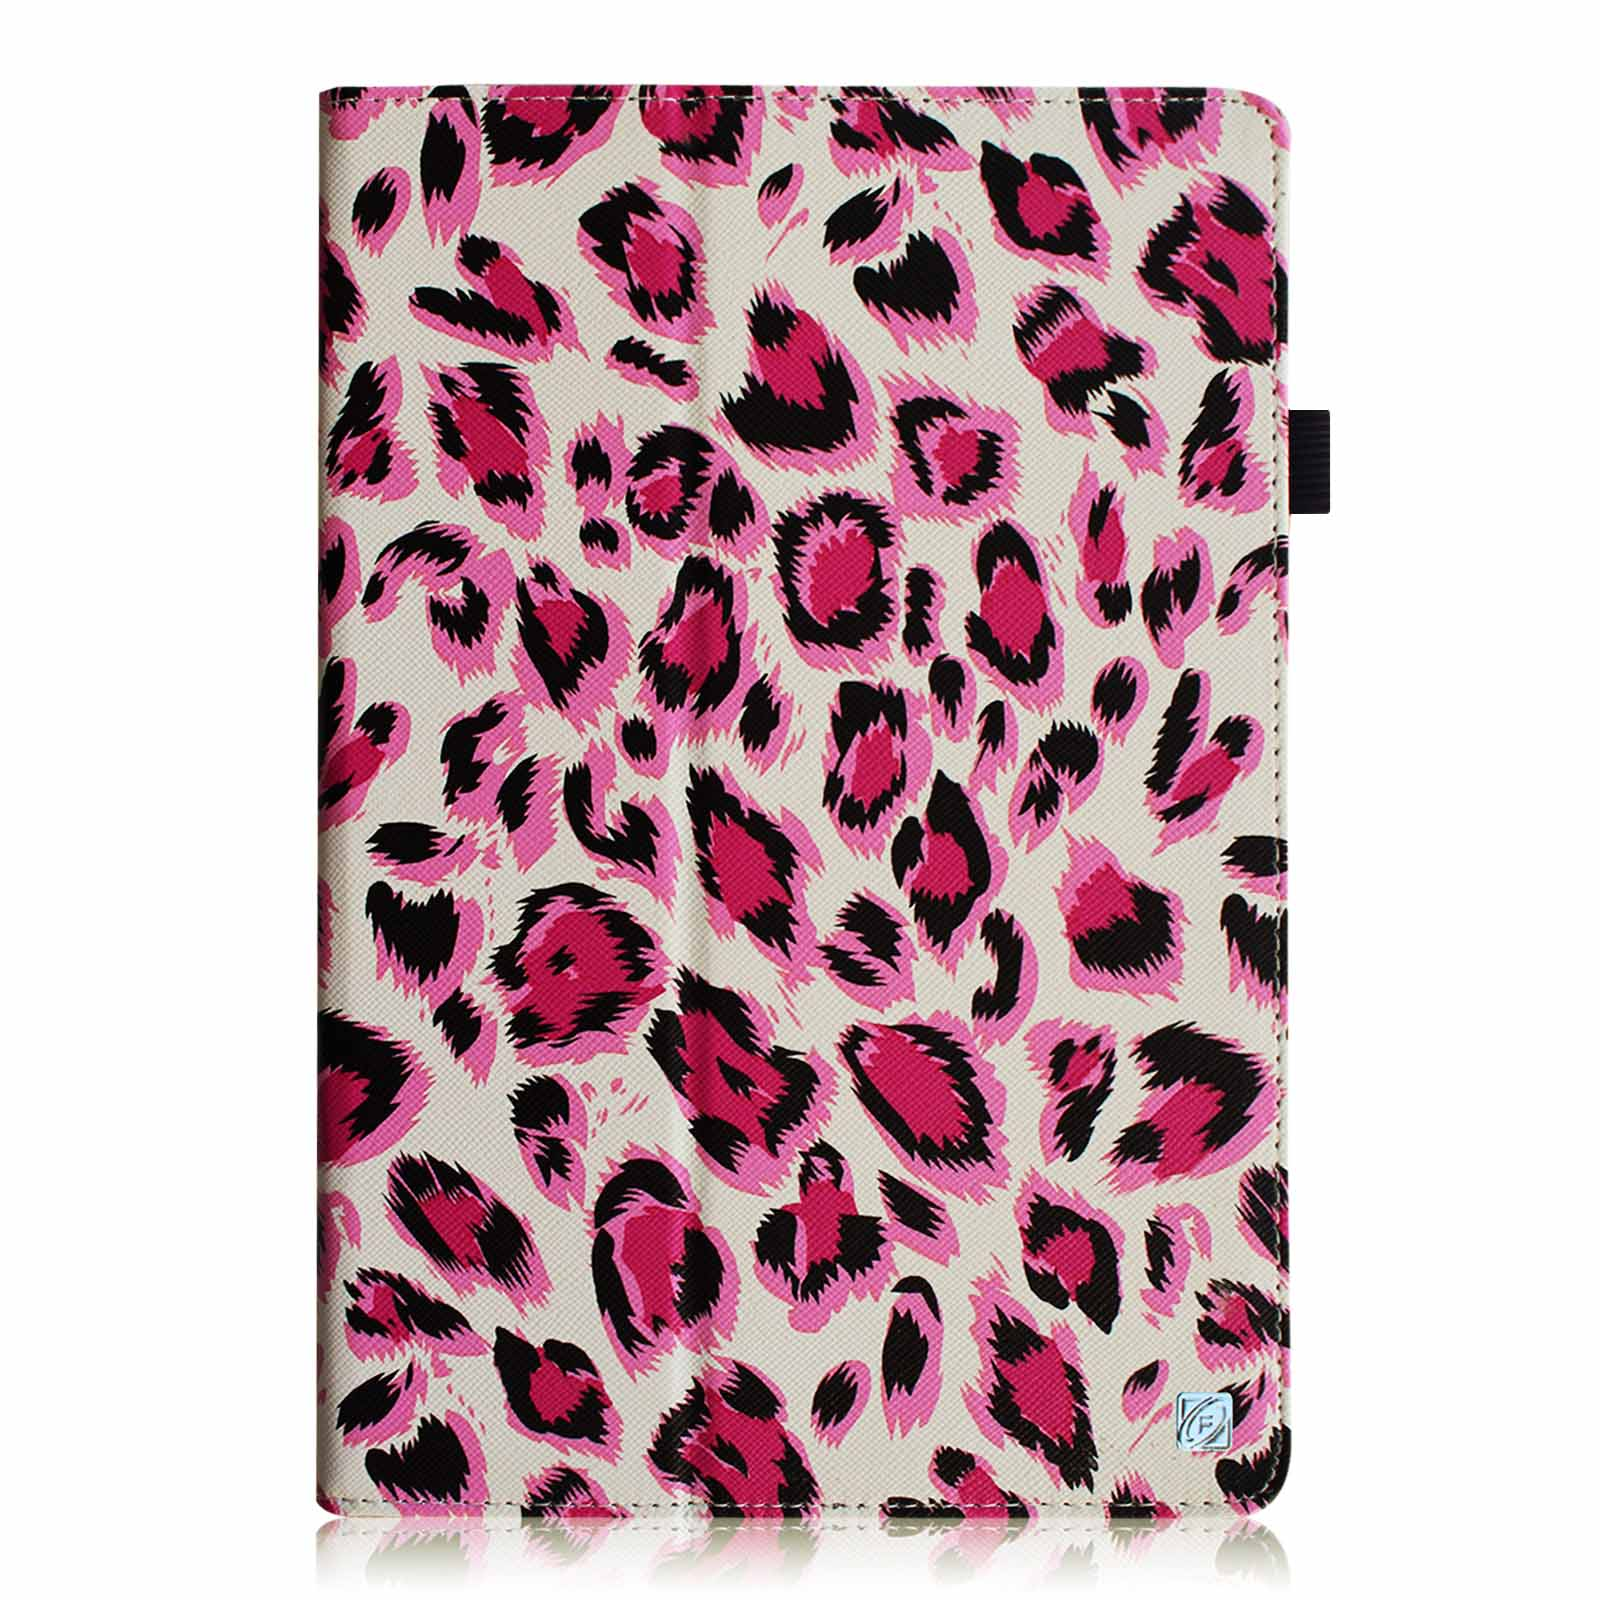 Fintie LG G PAD 8 3 Model V500/V510 (Wifi Version) & VK810 (Verizon 4G LTE)  Case PU Leather Stand Cover, Leopard Pink